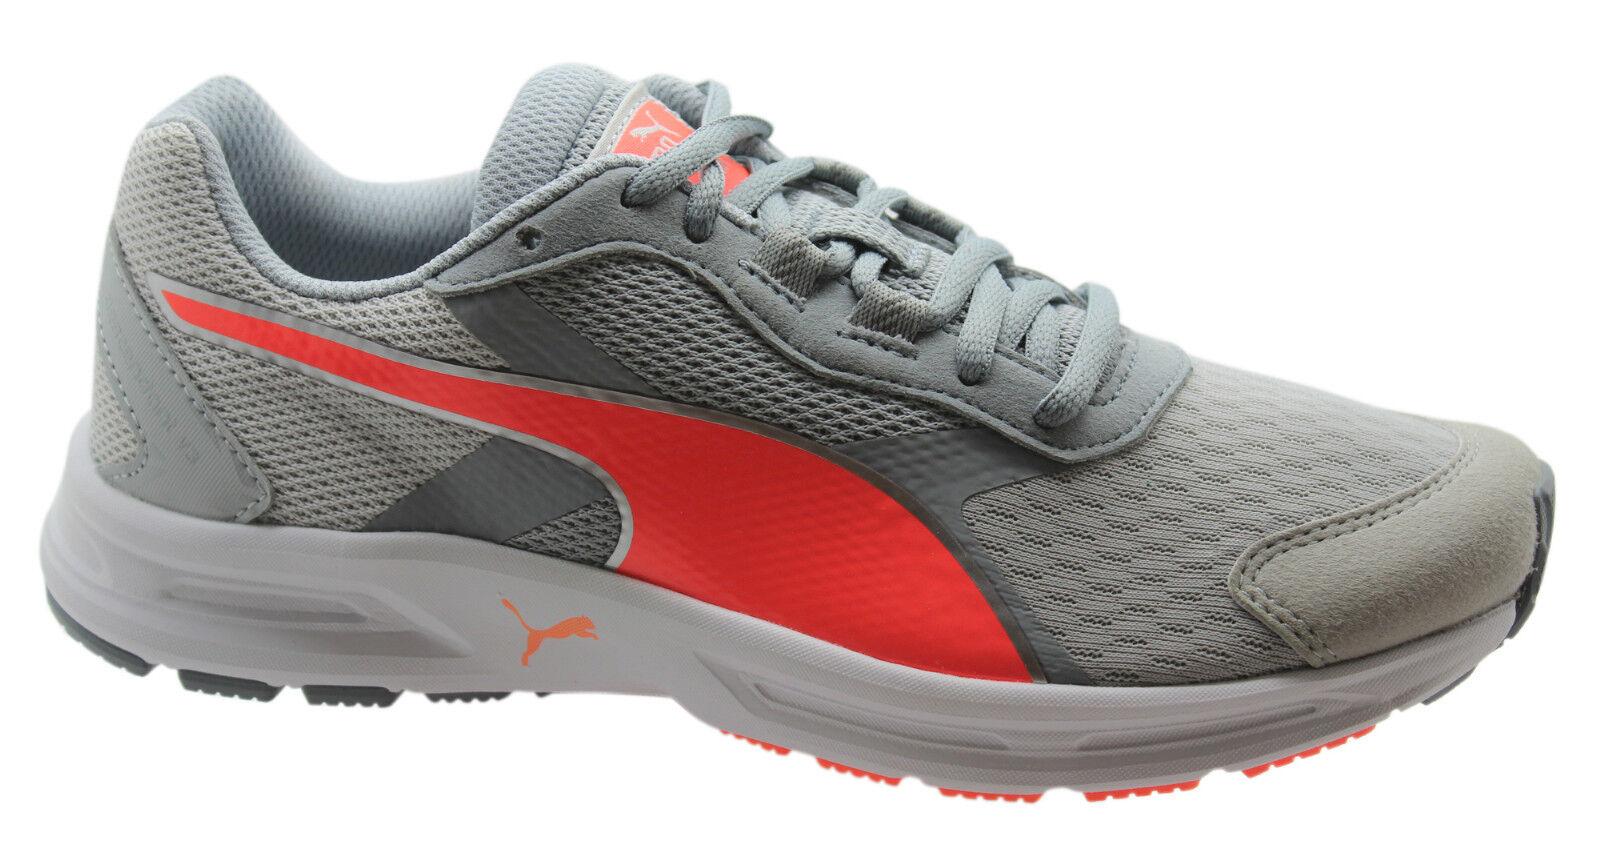 Puma Descendant V3 Womens Trainers Running shoes Grey Lace Up 188166 07 U50